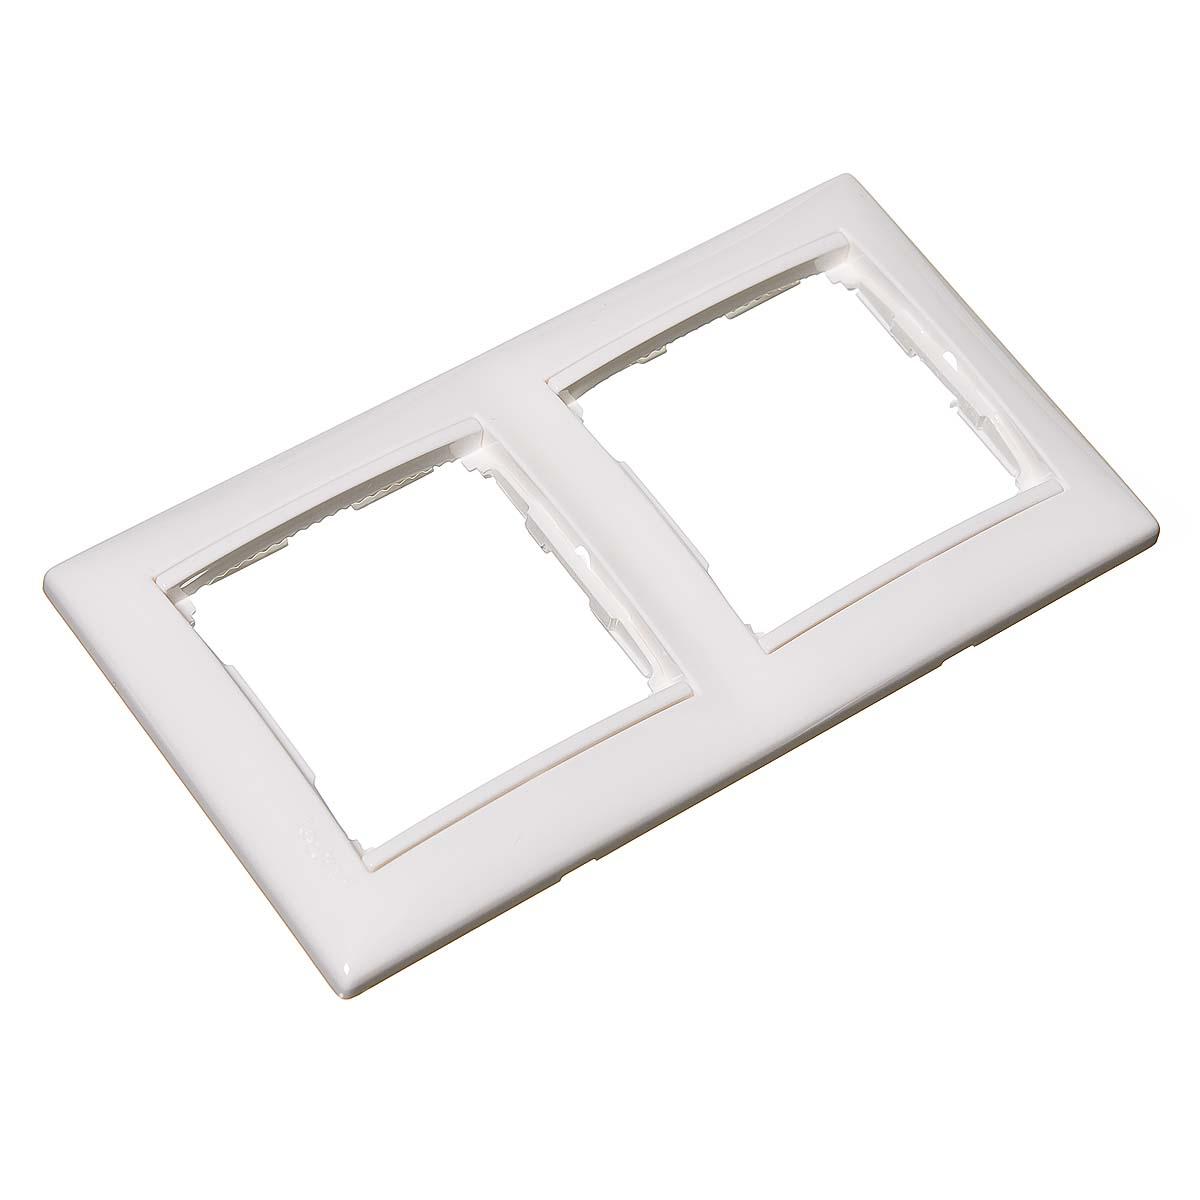 Рамка двухместная Legrand Valena белая